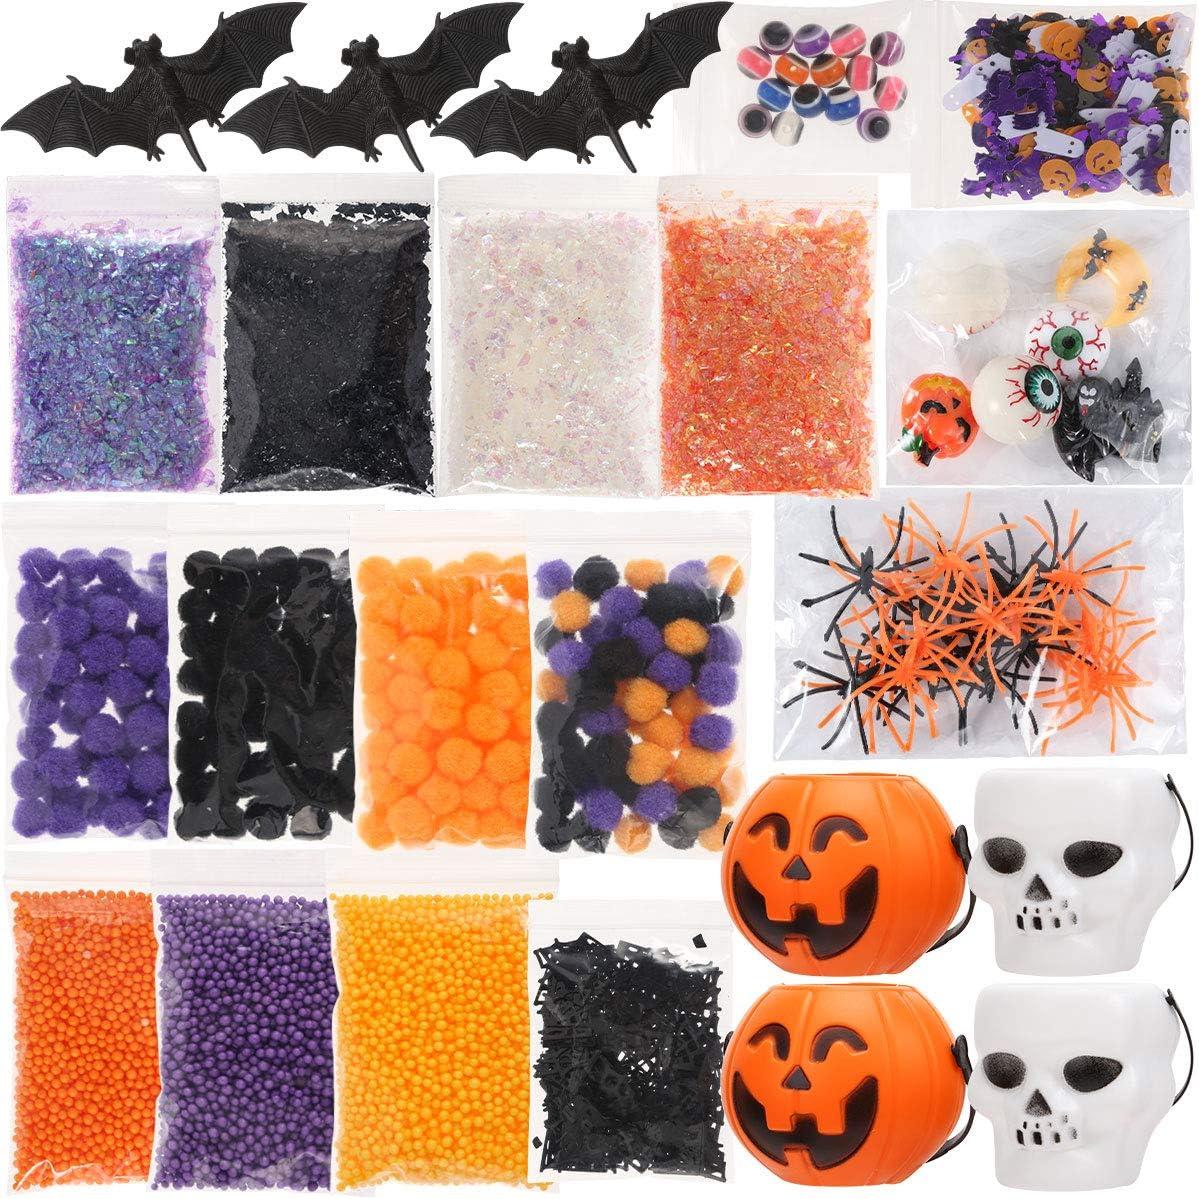 Luclay Slime Kit de Suministros de Halloween, Kit de Limo Esponjoso de Bricolaje, Juego de Limo de Cristal para niñas, niños, Juguetes, Accesorios para Manualidades artísticas para niños